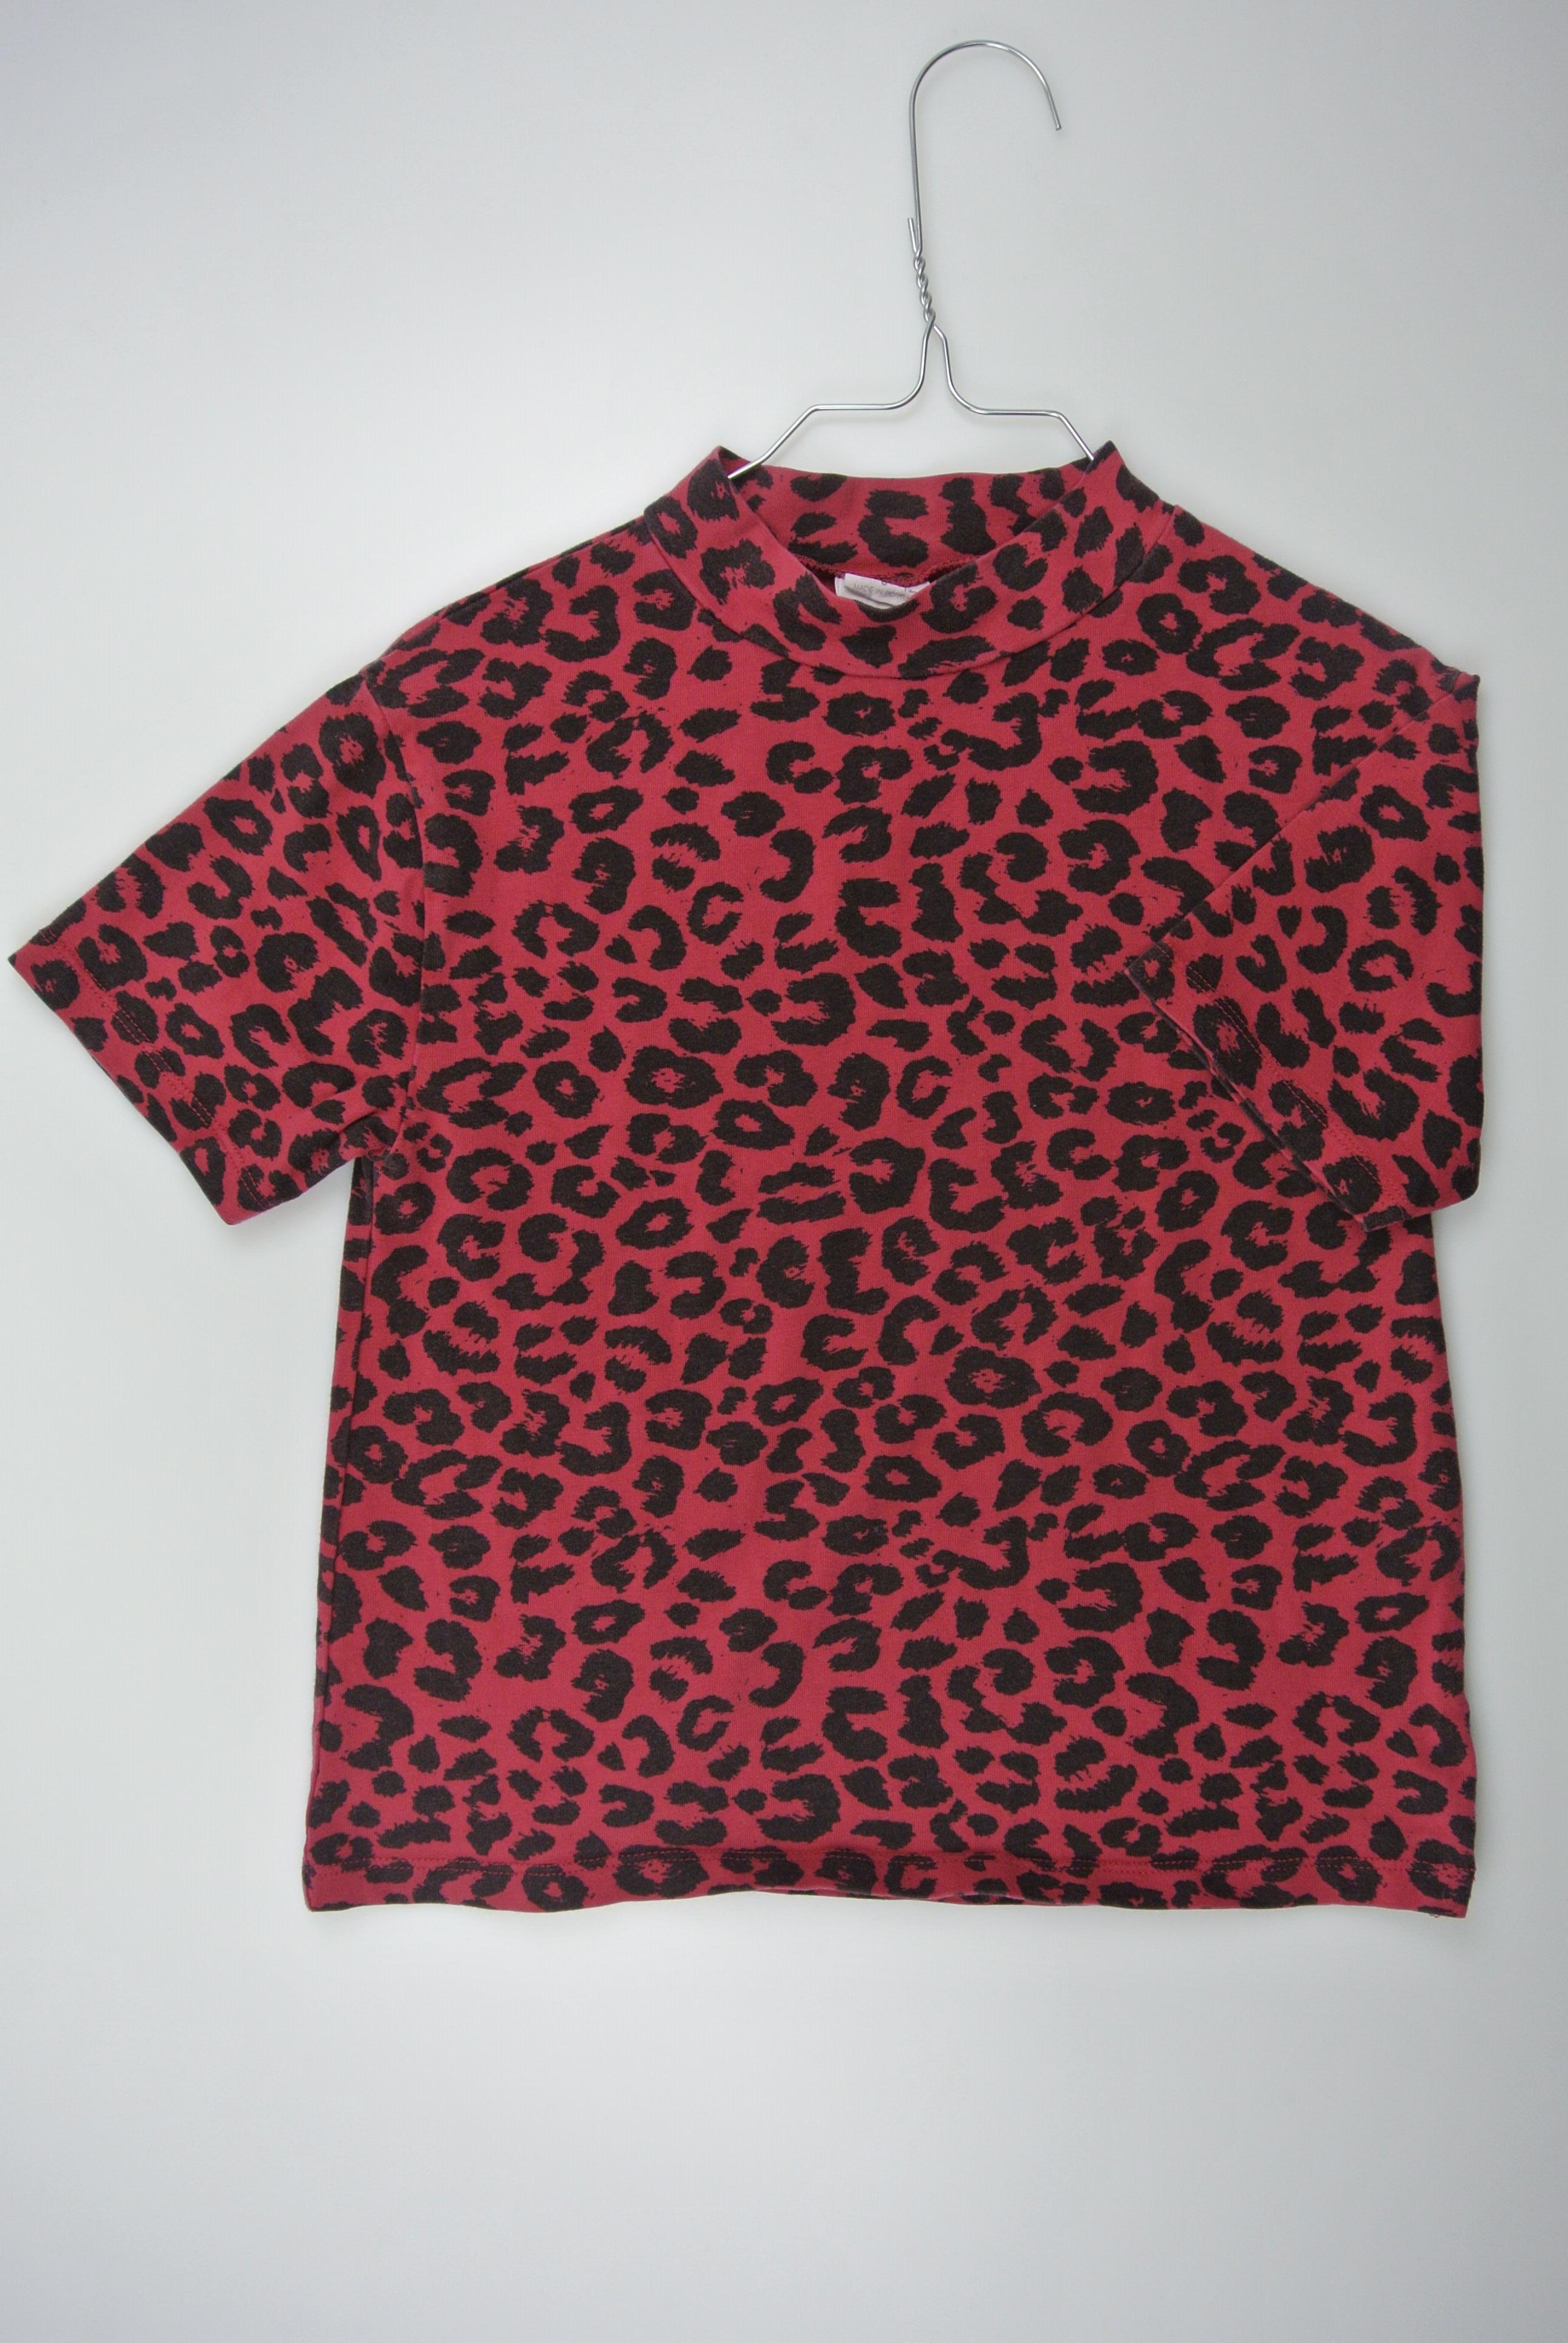 Zara t-shirt str 128 pige